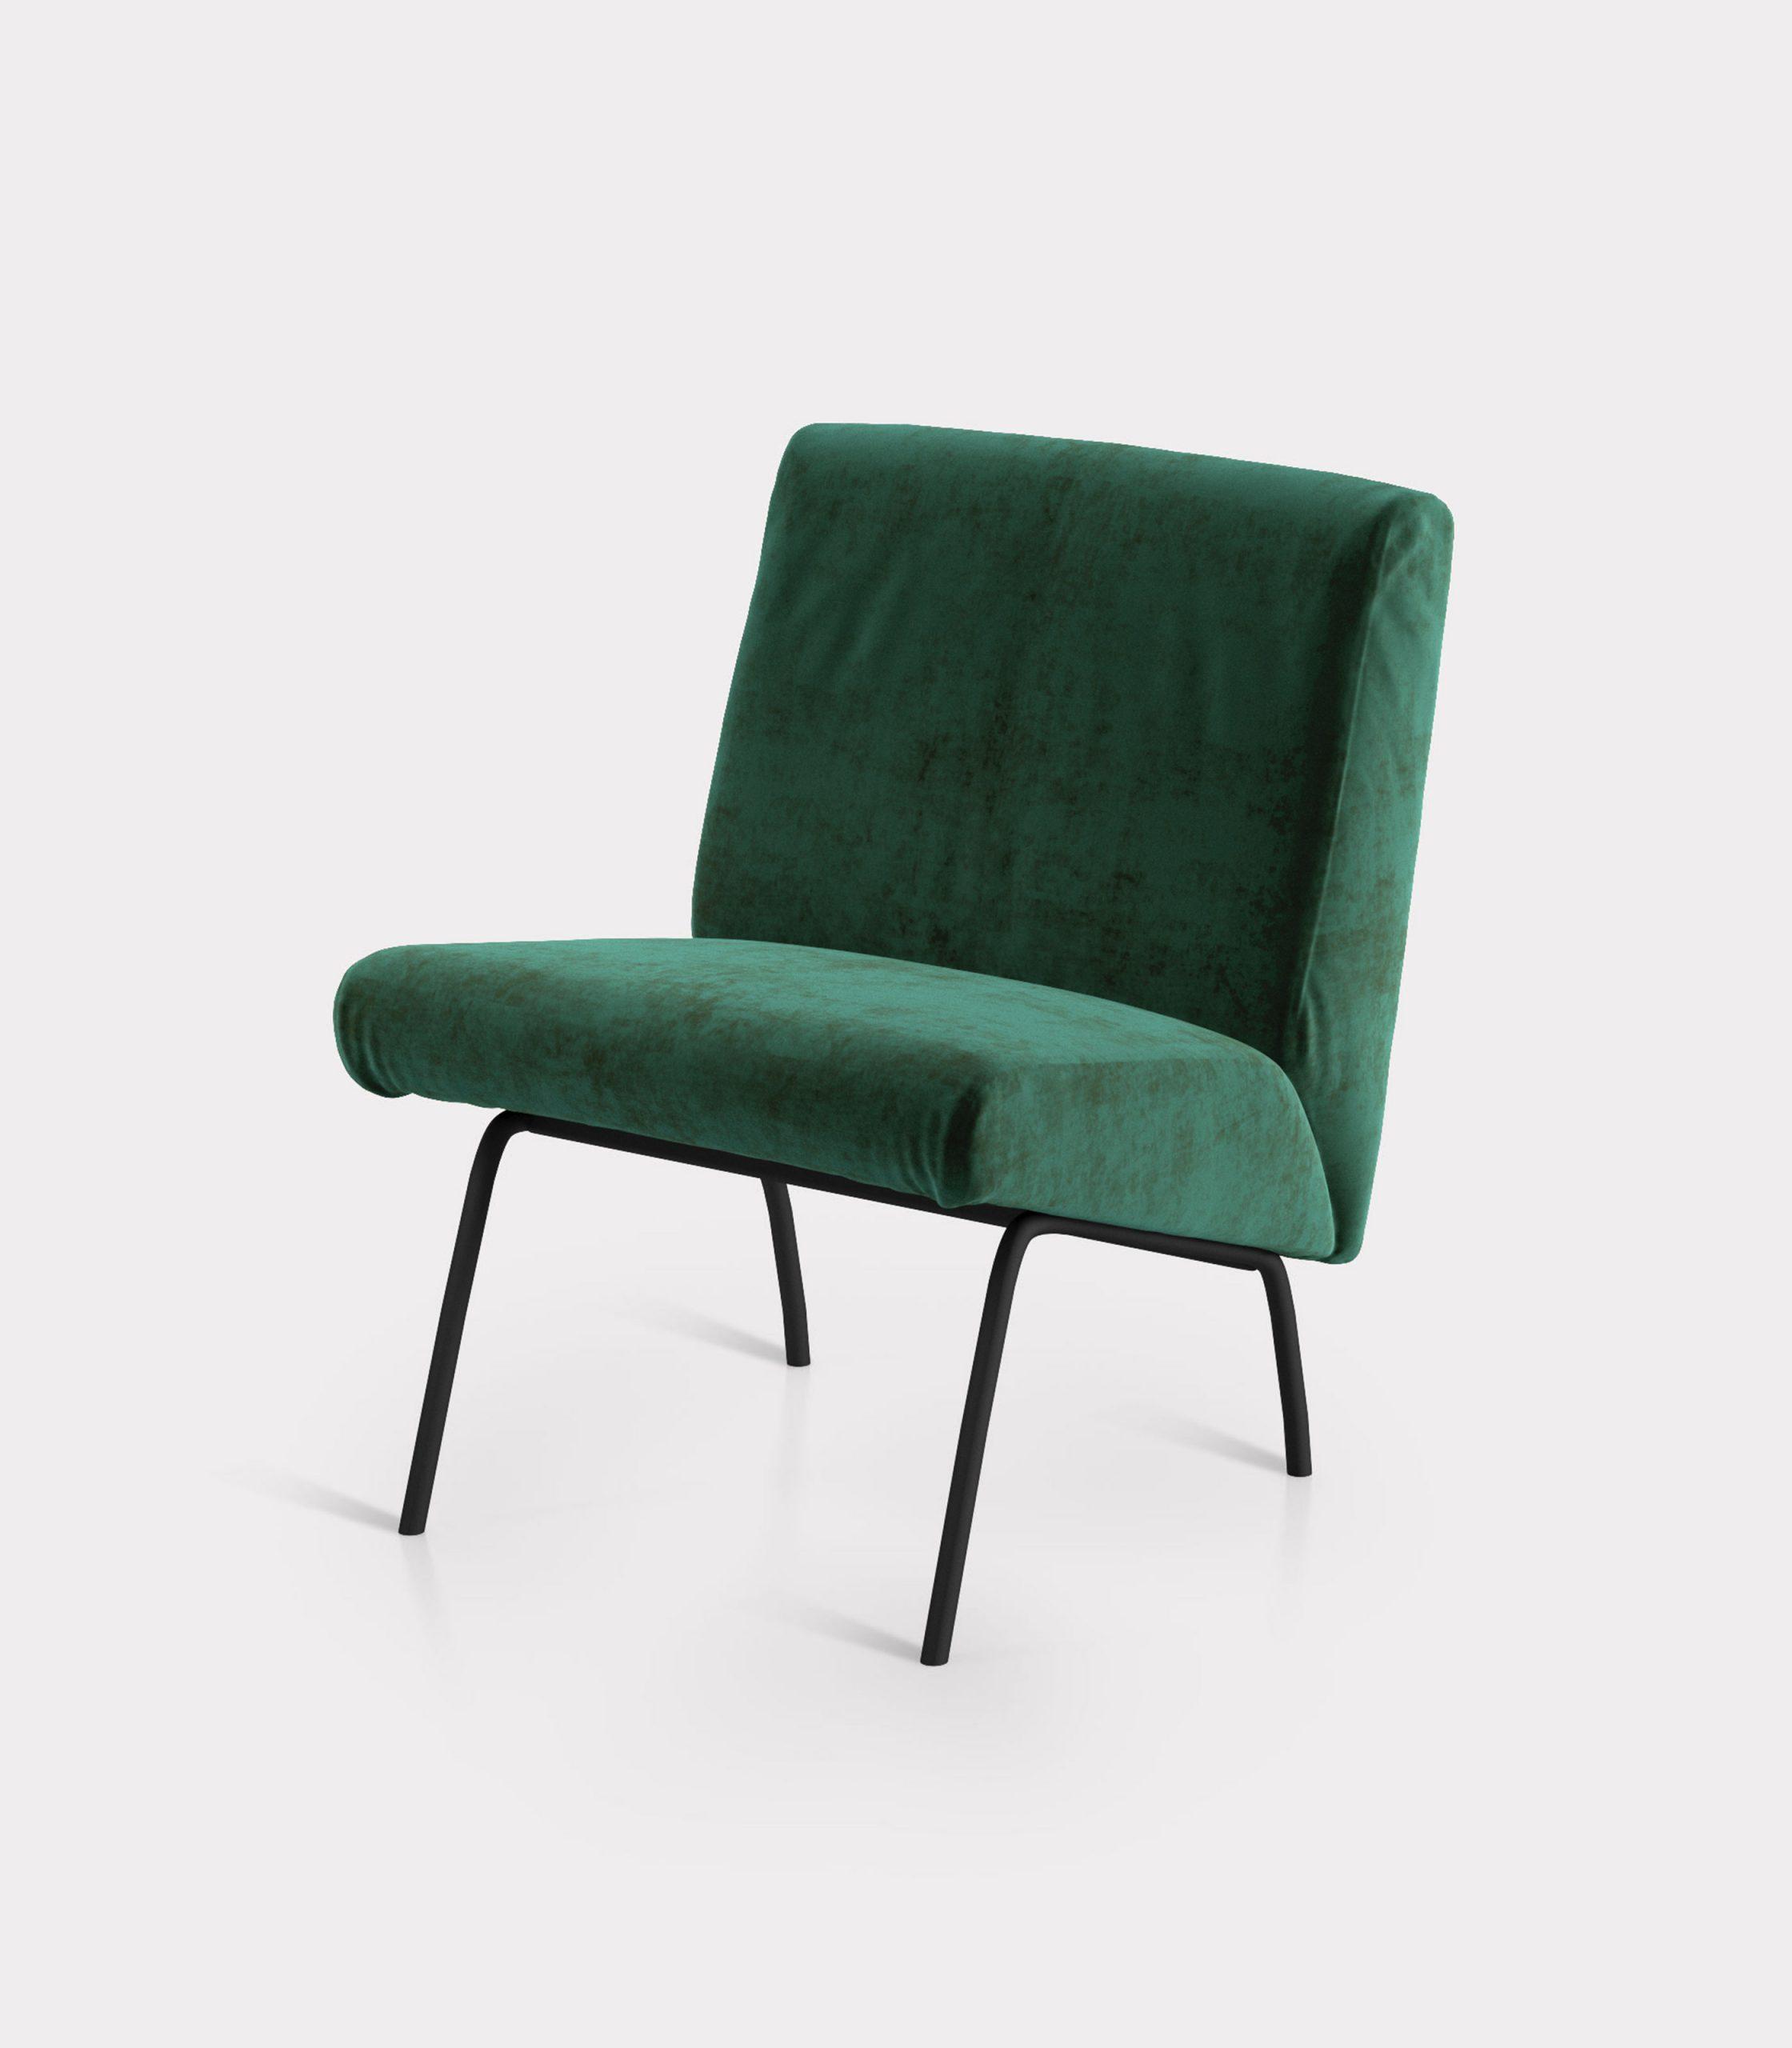 poltrona velluto verde loopo milan design FS